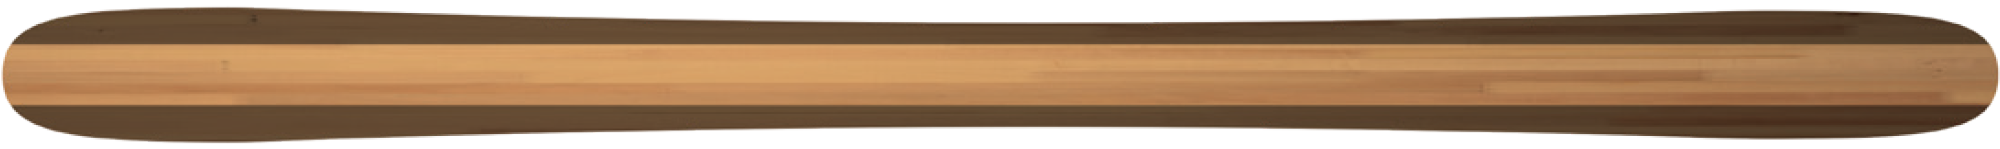 k2_2122_double-barrel.mkv